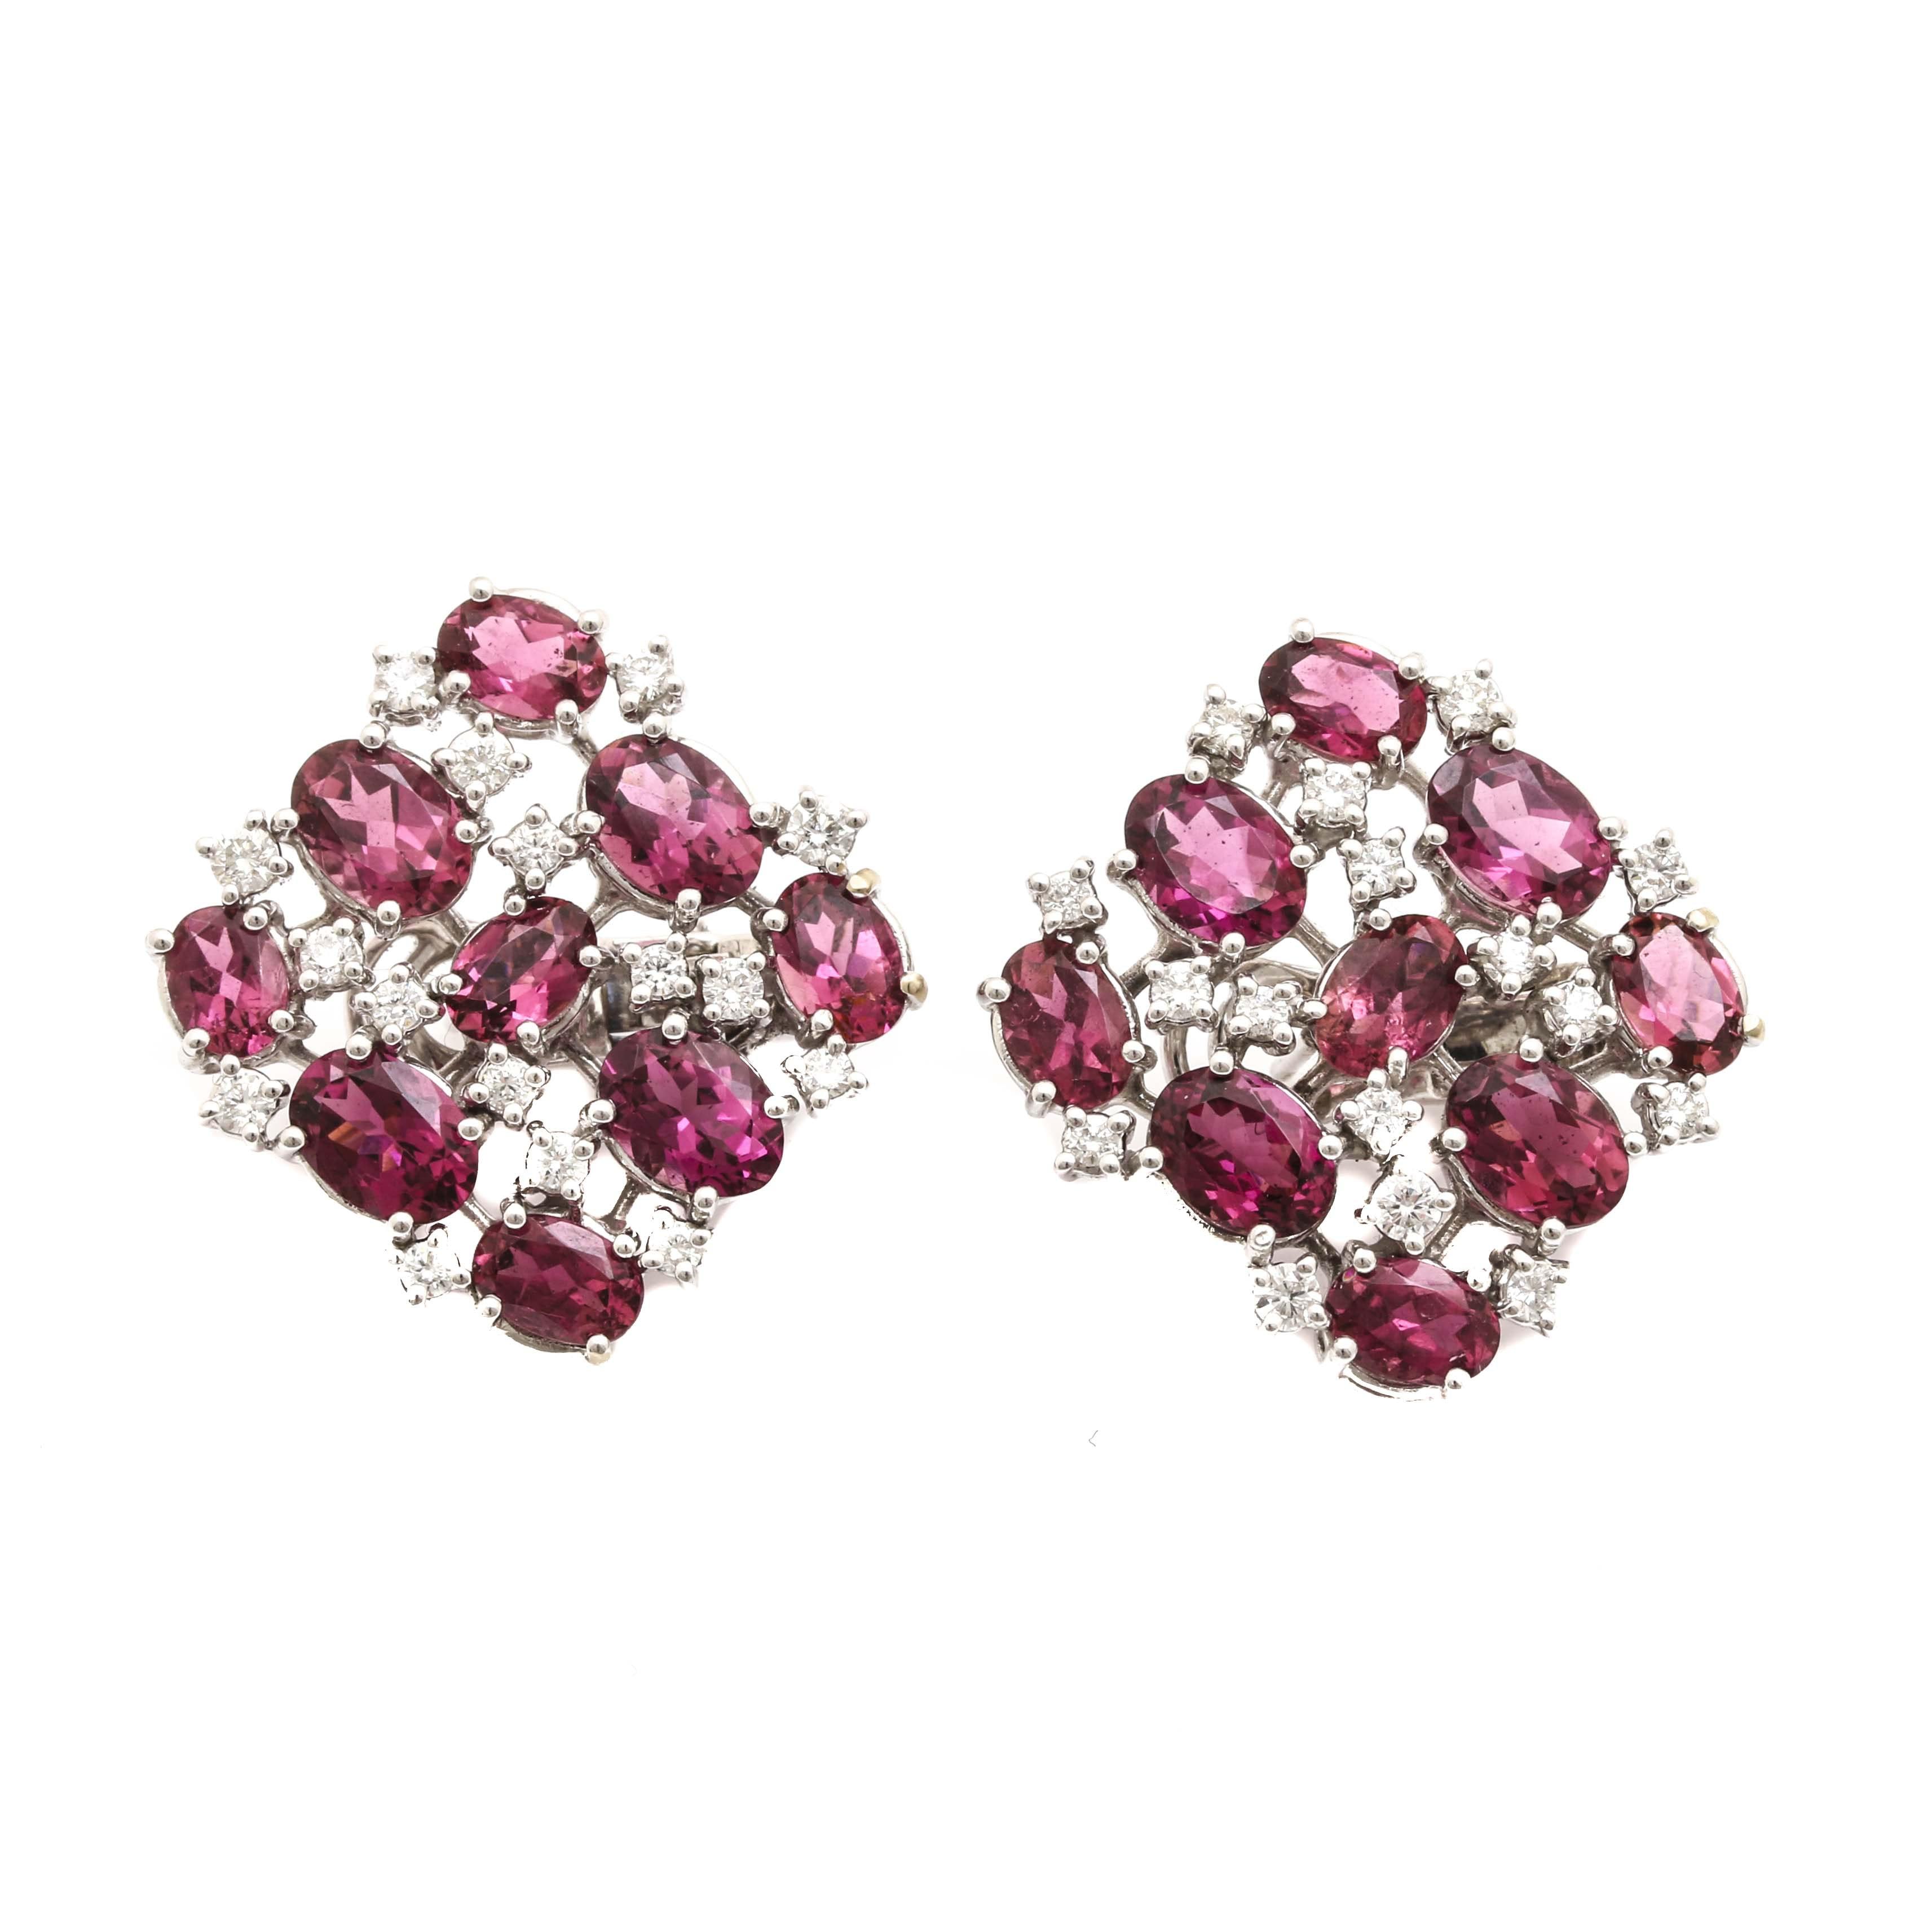 18K White Gold Pink Tourmaline and Diamond Earrings